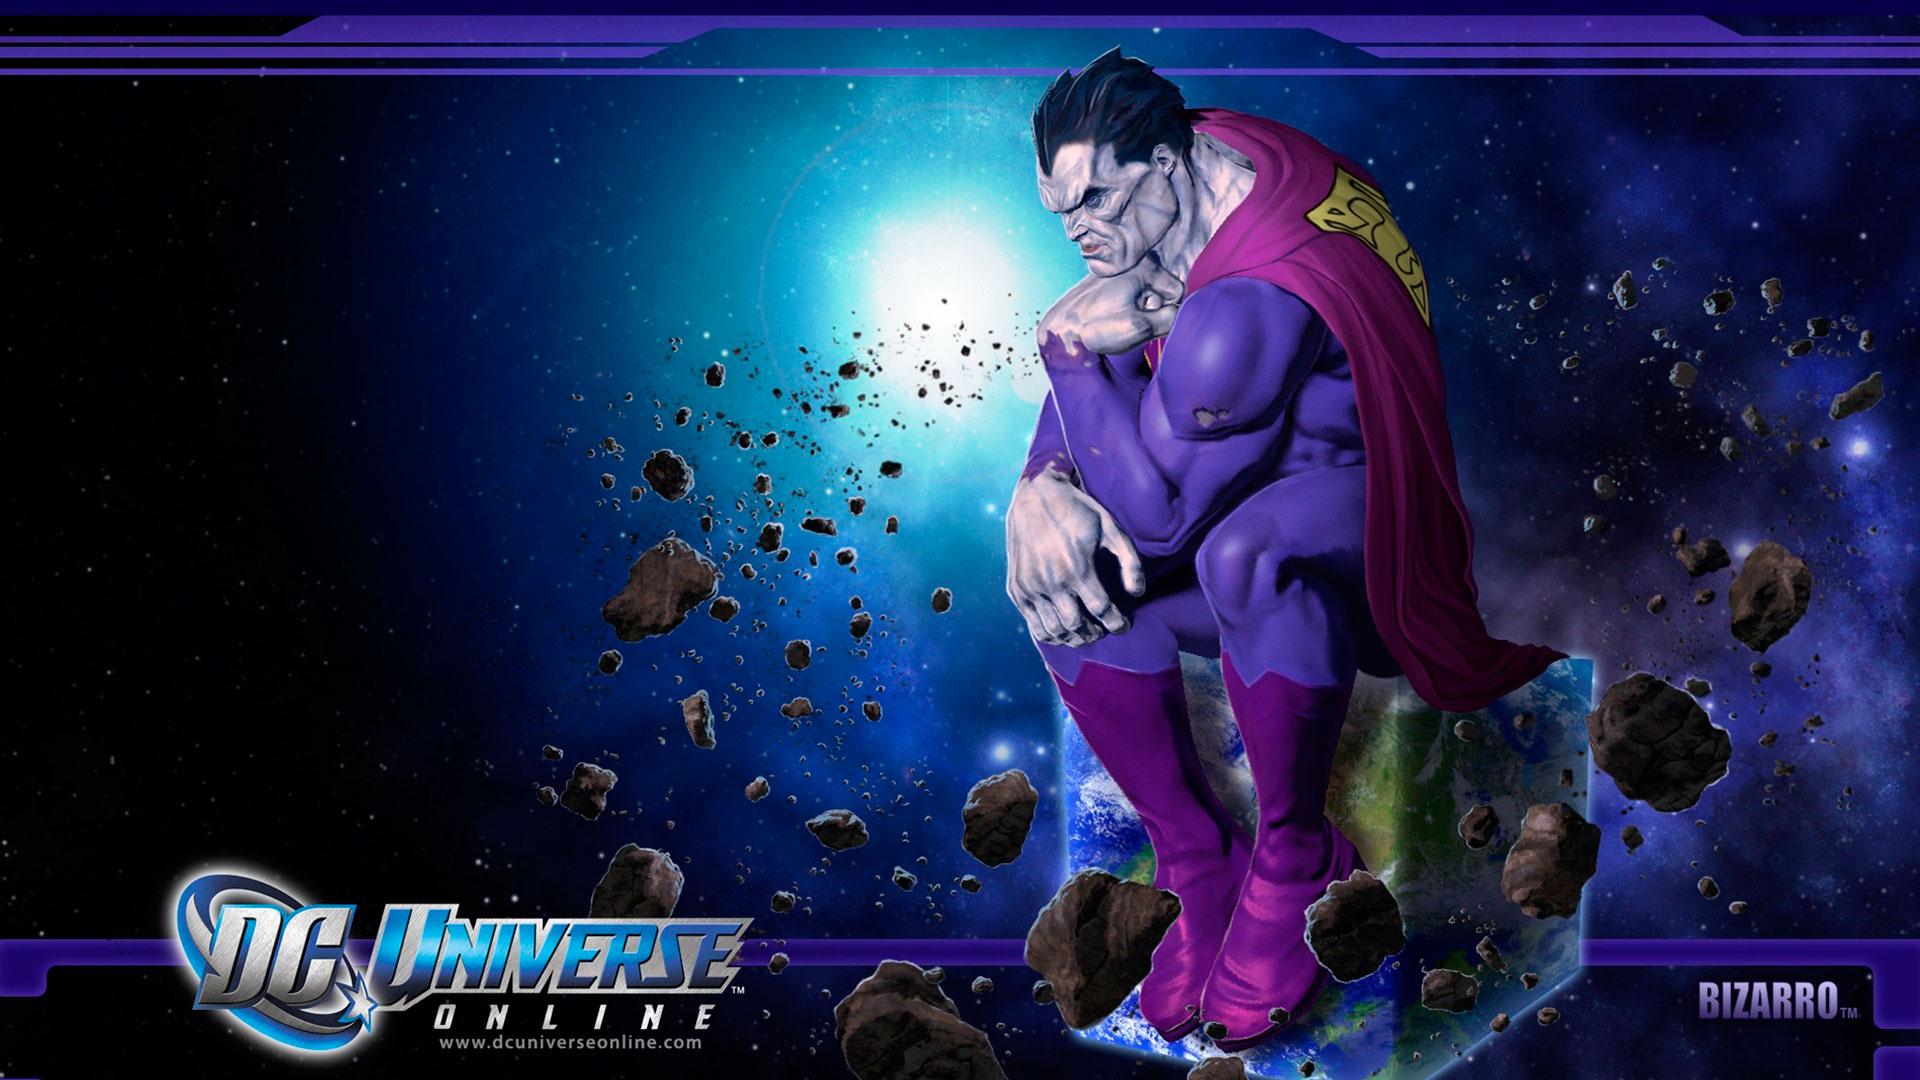 DC Universe Online 1080p Wallpaper DC Universe Online 720p Wallpaper 1920x1080